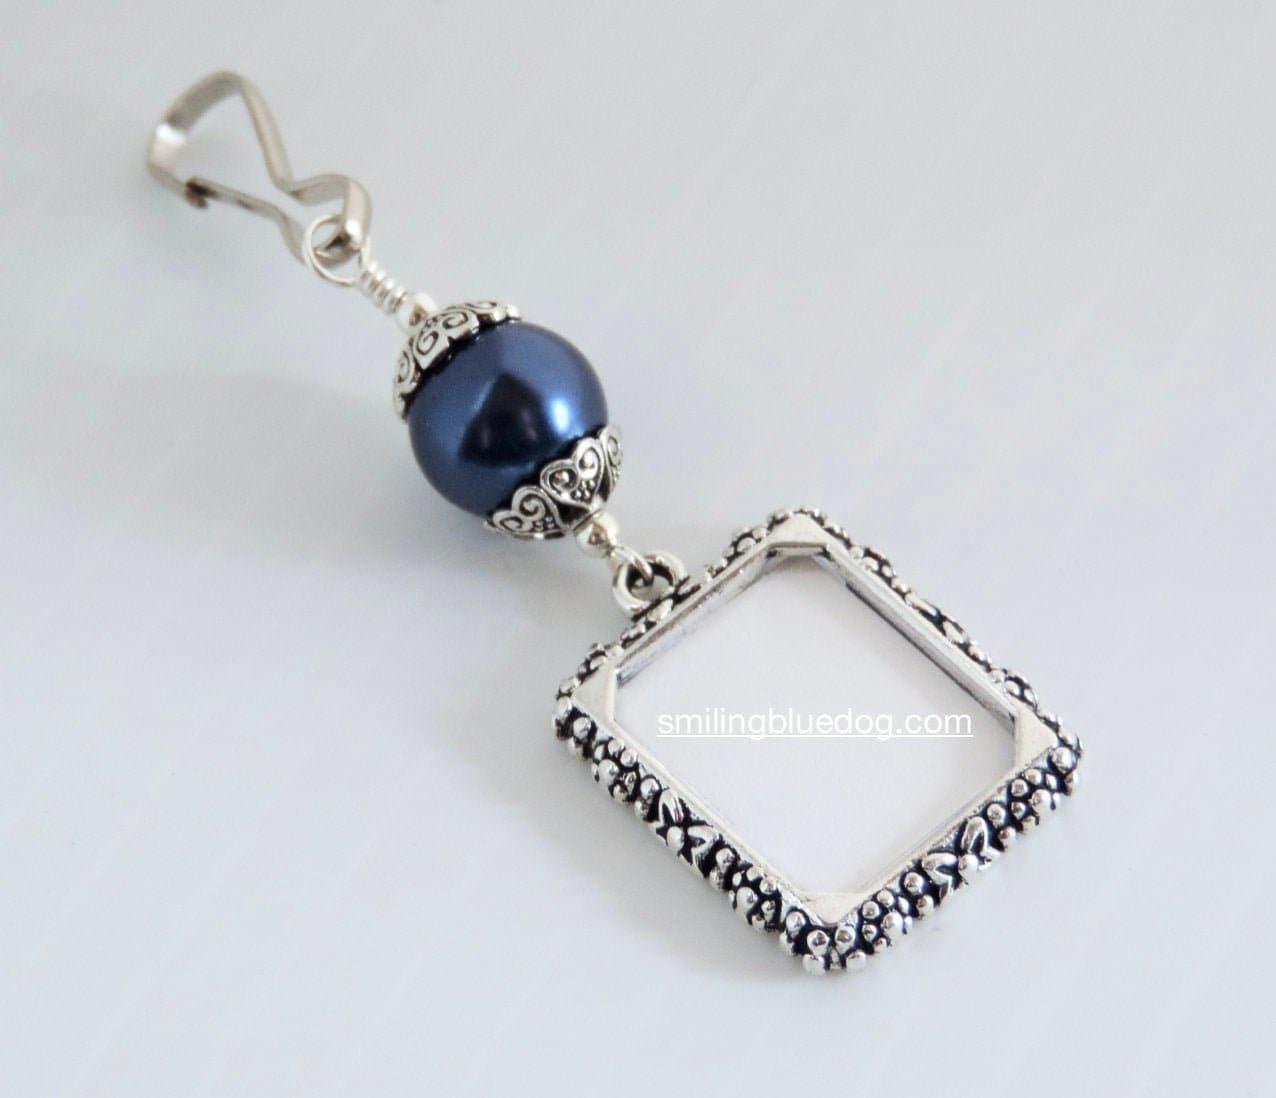 Custom Hand Stamped /& Hammered Edge Aluminum Bridal Wedding Bouquet Charm Something Blue Bouquet Charm